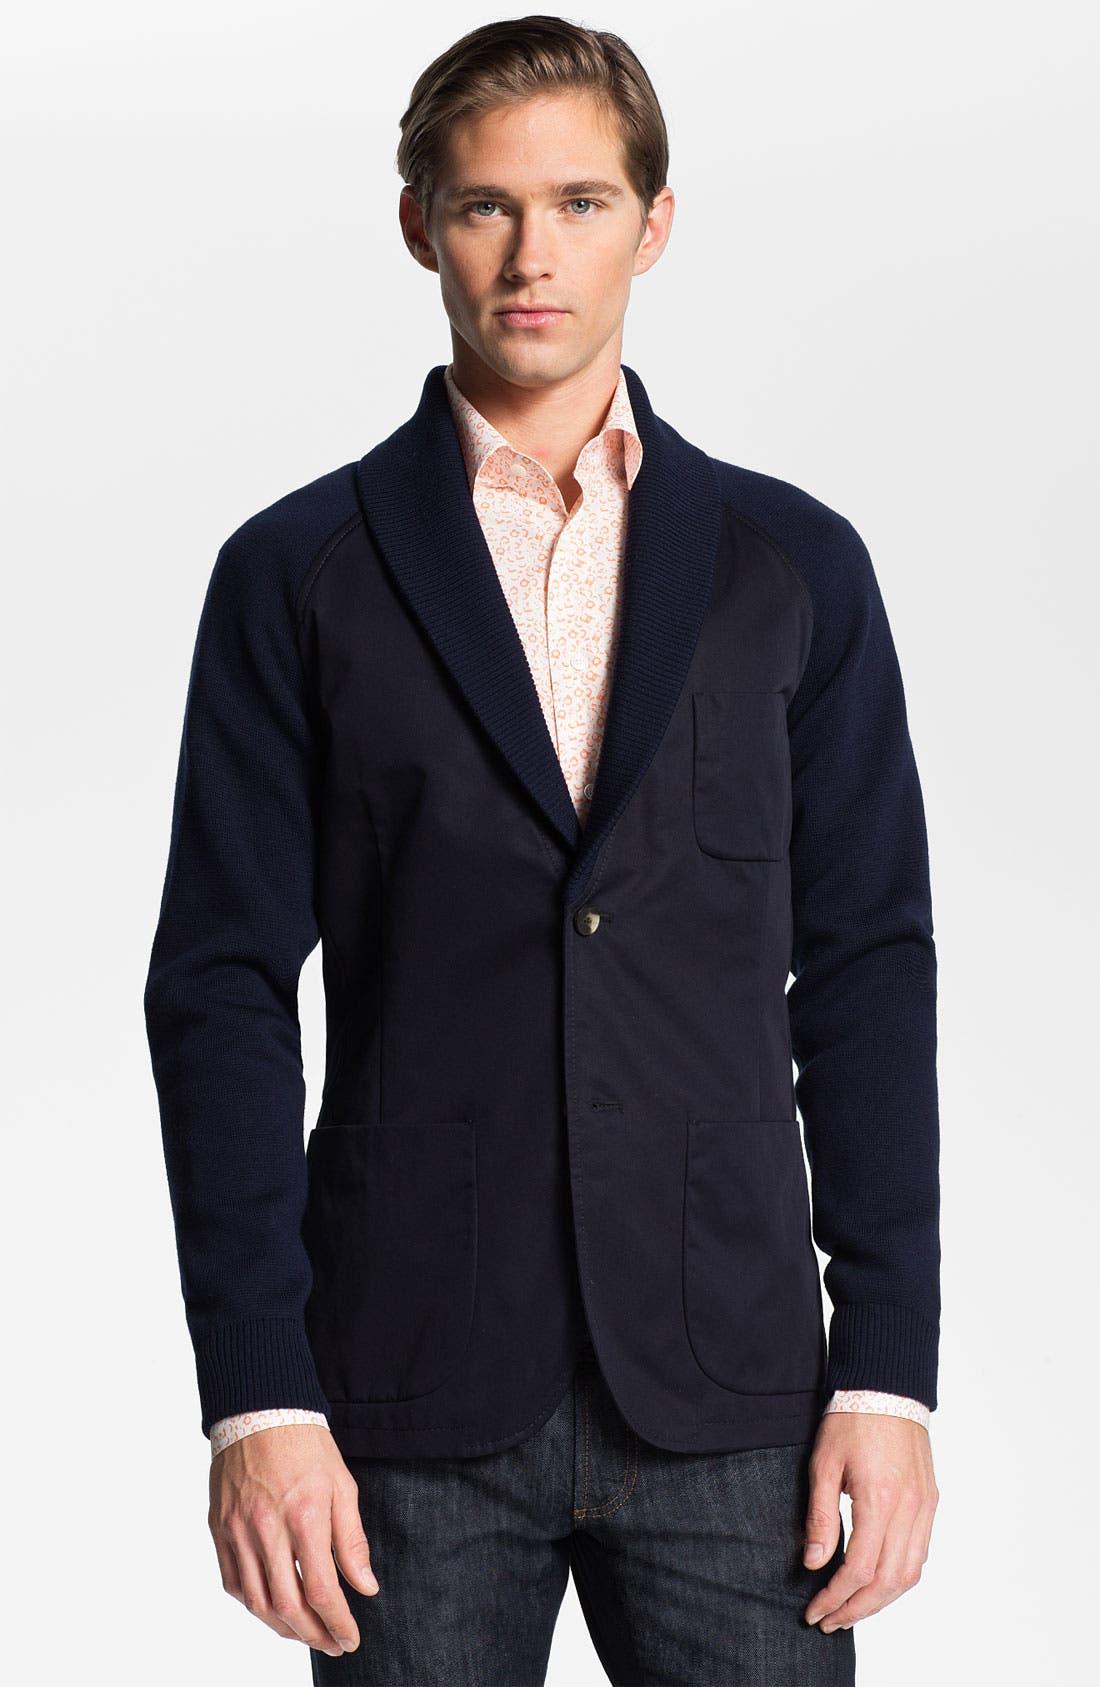 Main Image - Salvatore Ferragamo Shawl Collar Sportcoat with Knit Trim